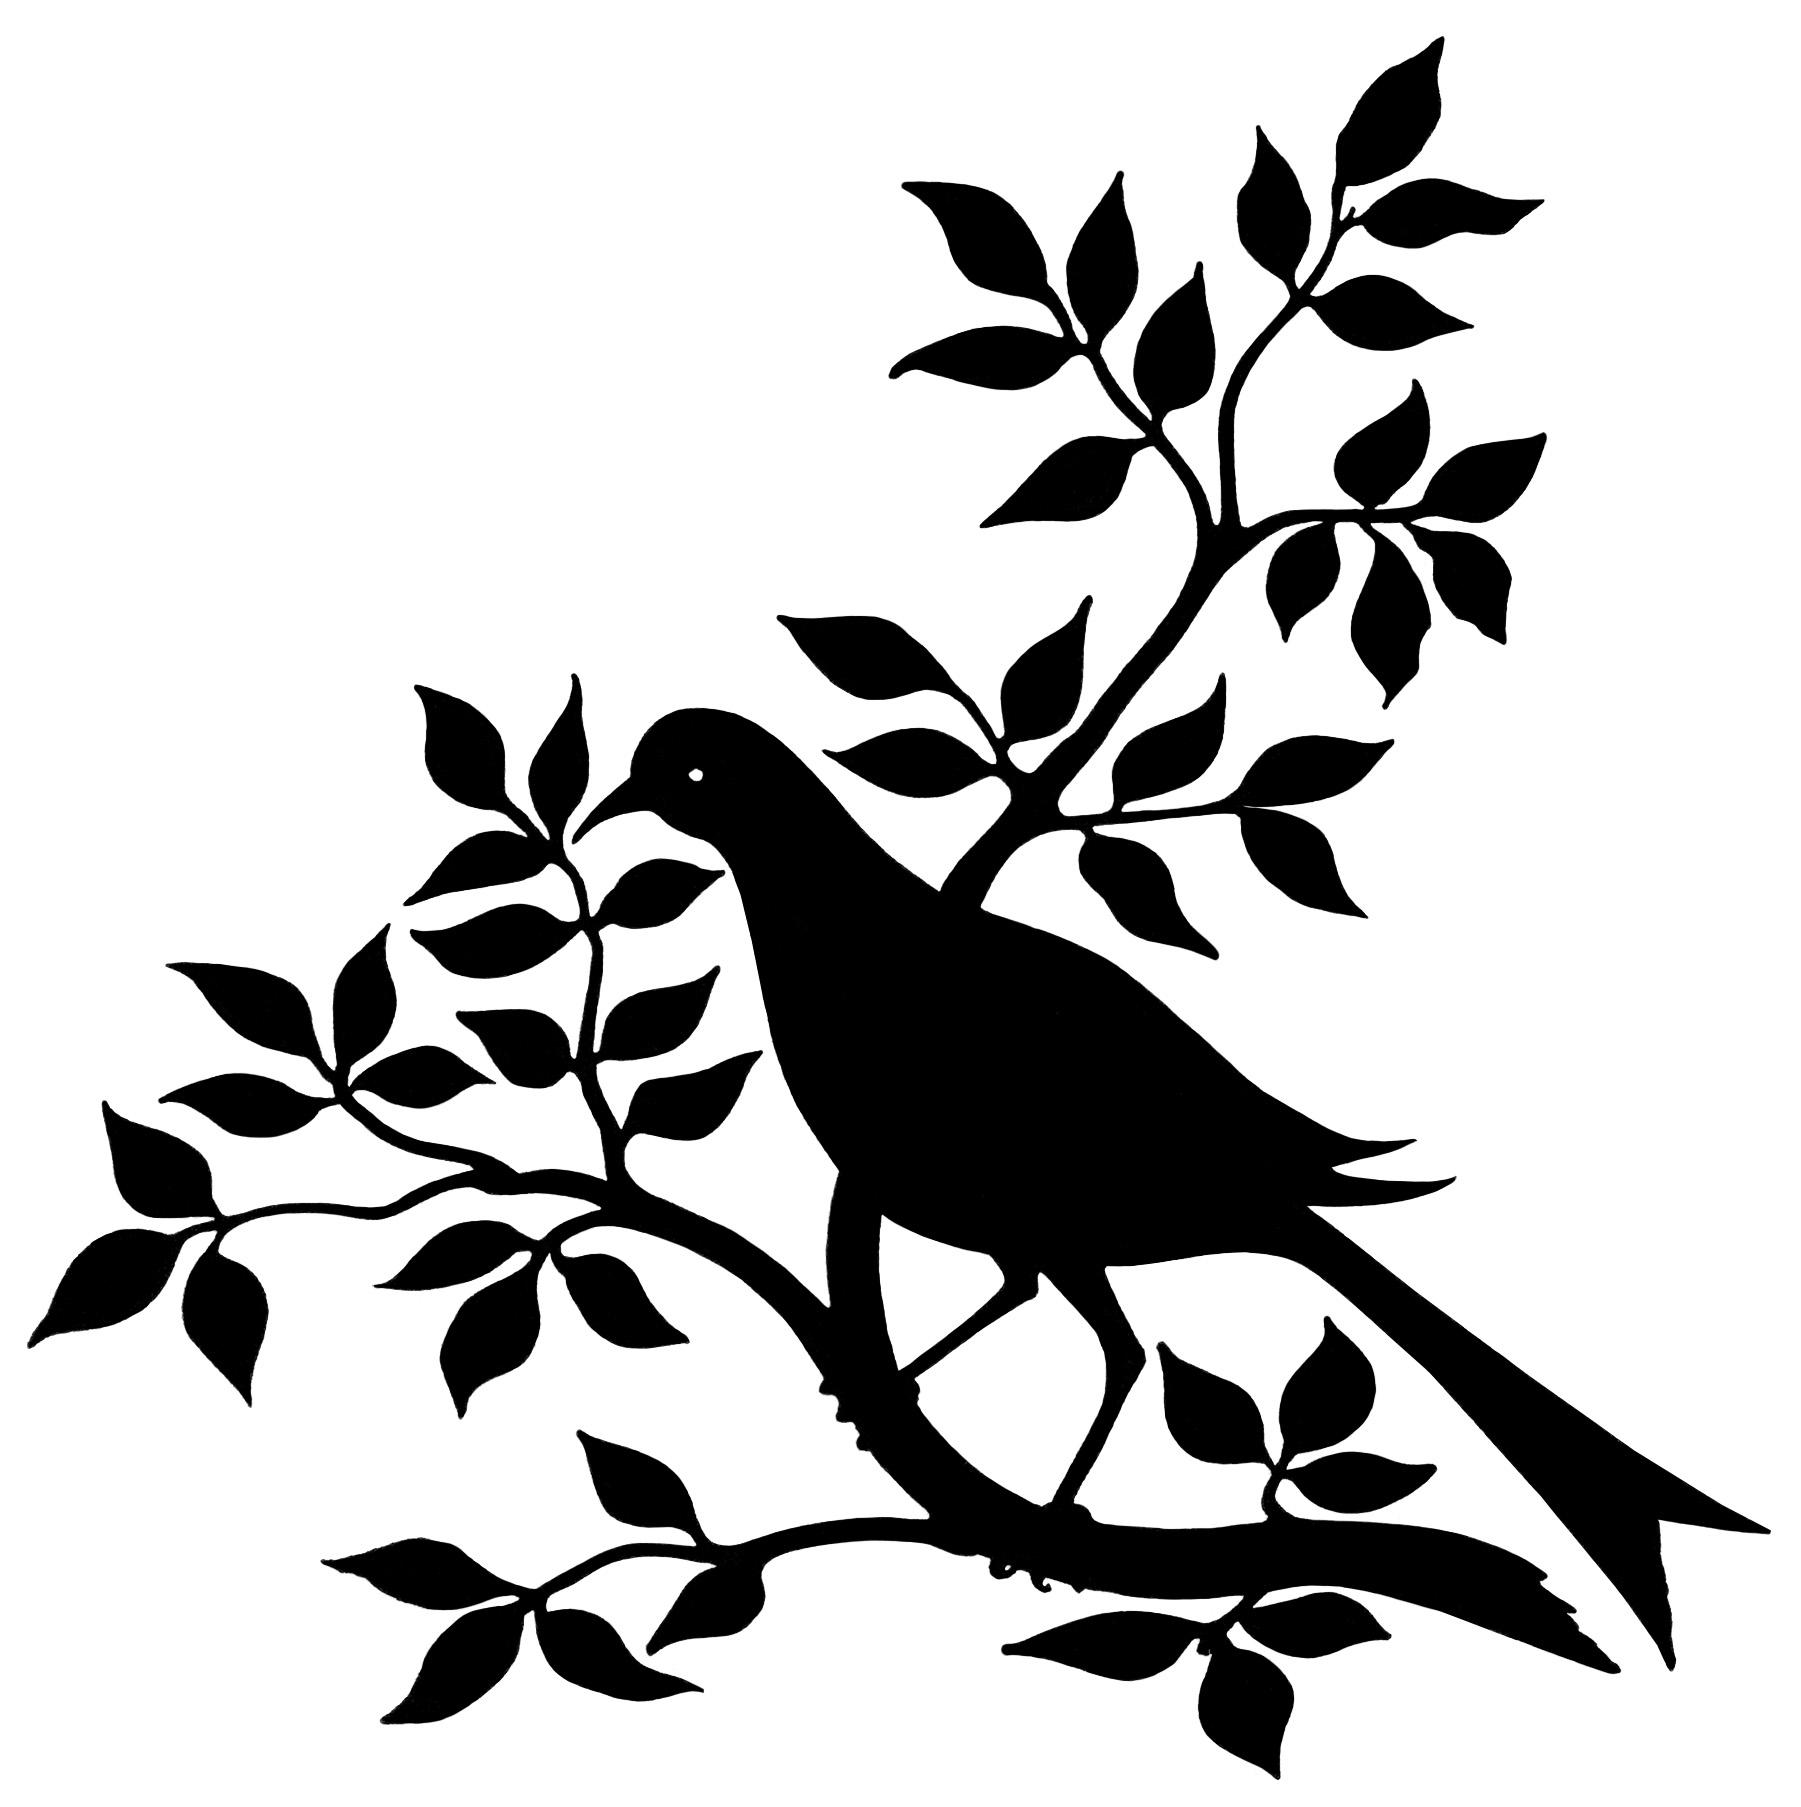 Bird On Branch Silhouette Free Graphic